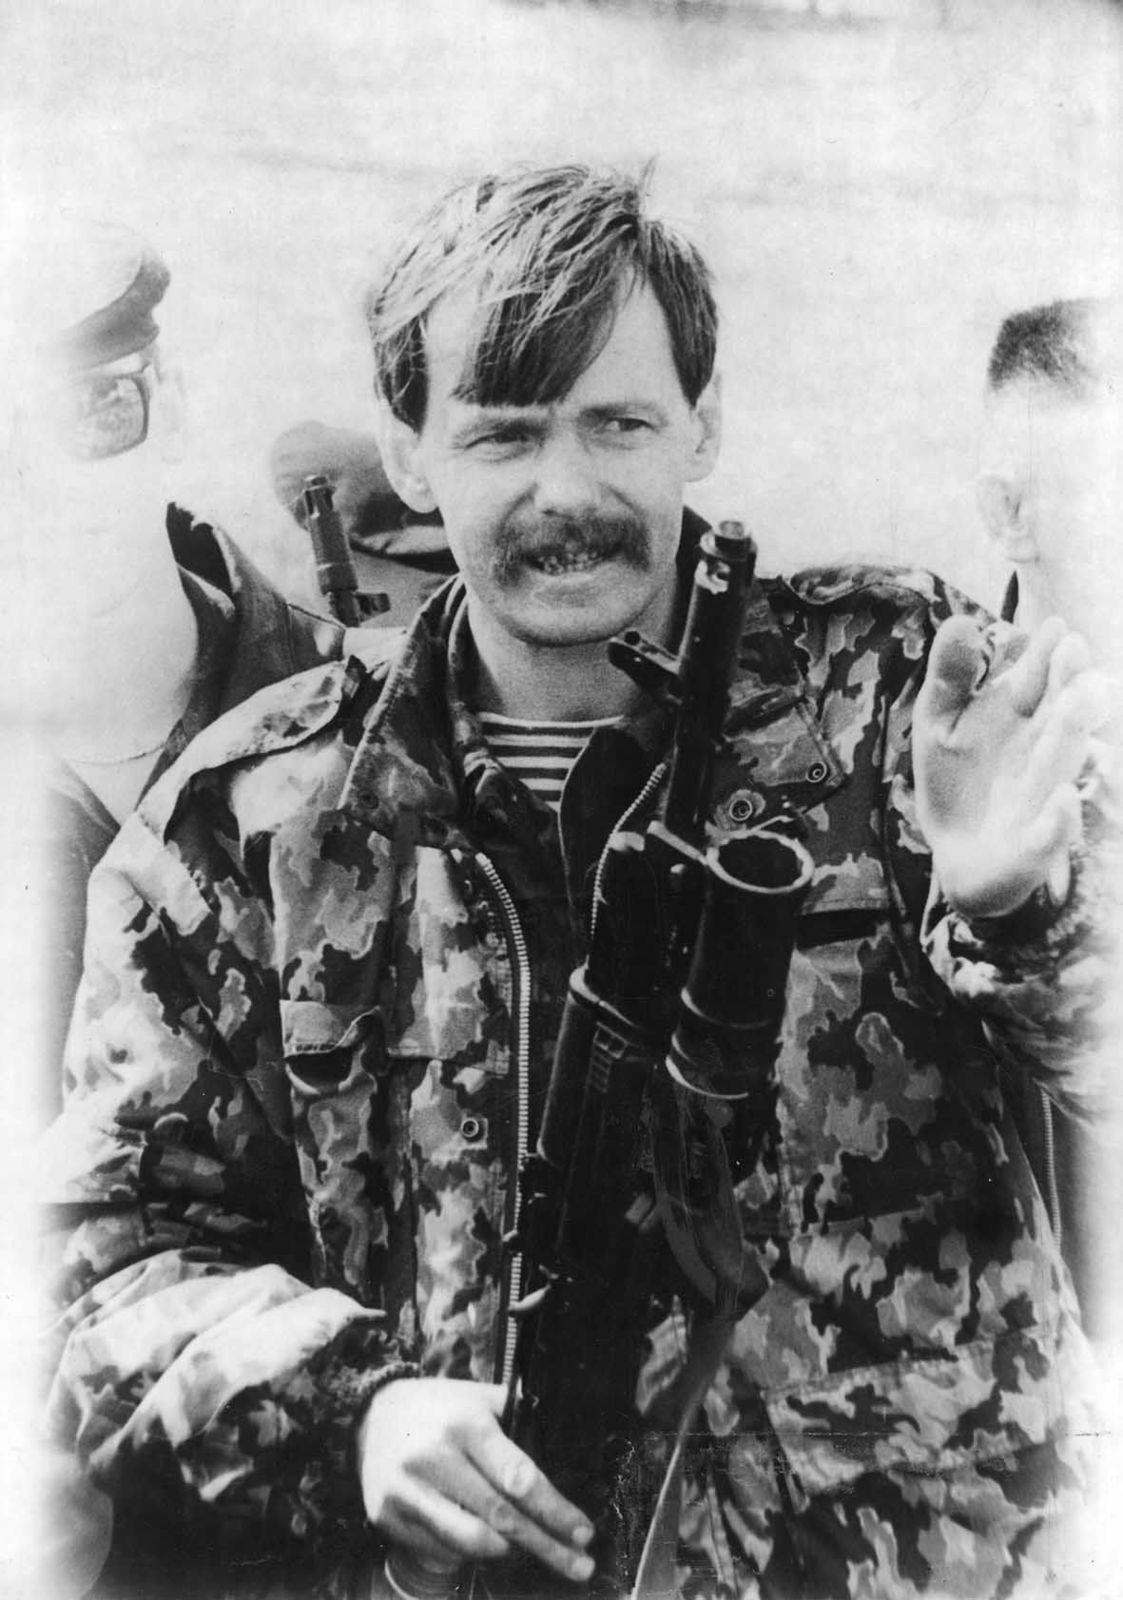 Командир якутского ОМОНа, пример для бойцов любого ранга